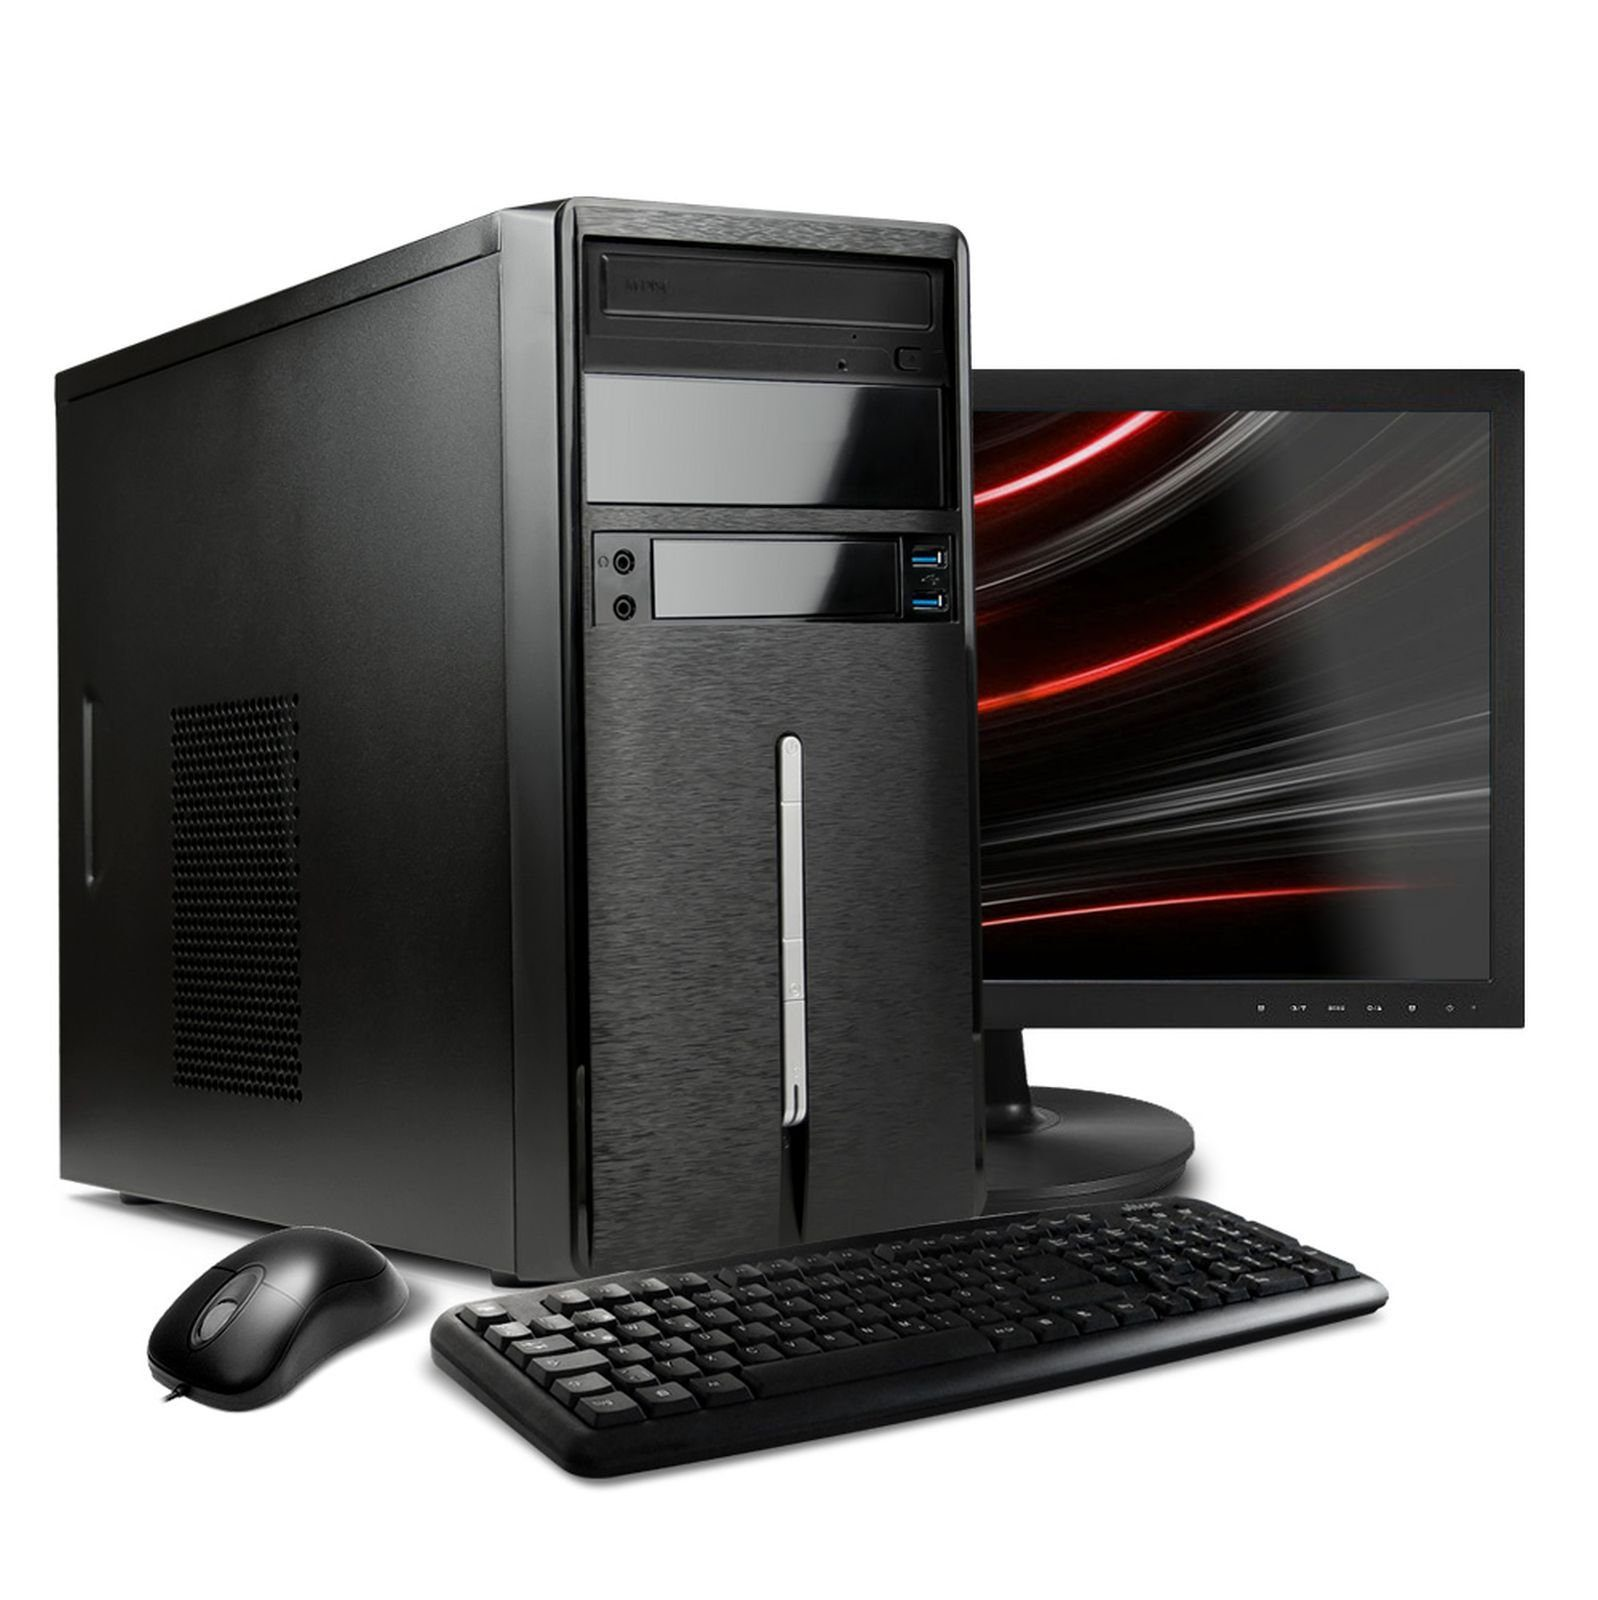 "VCM PC-Set / AMD FX-4300 / »Radeon HD3000 / Windows 10 / 22"" TFT«"